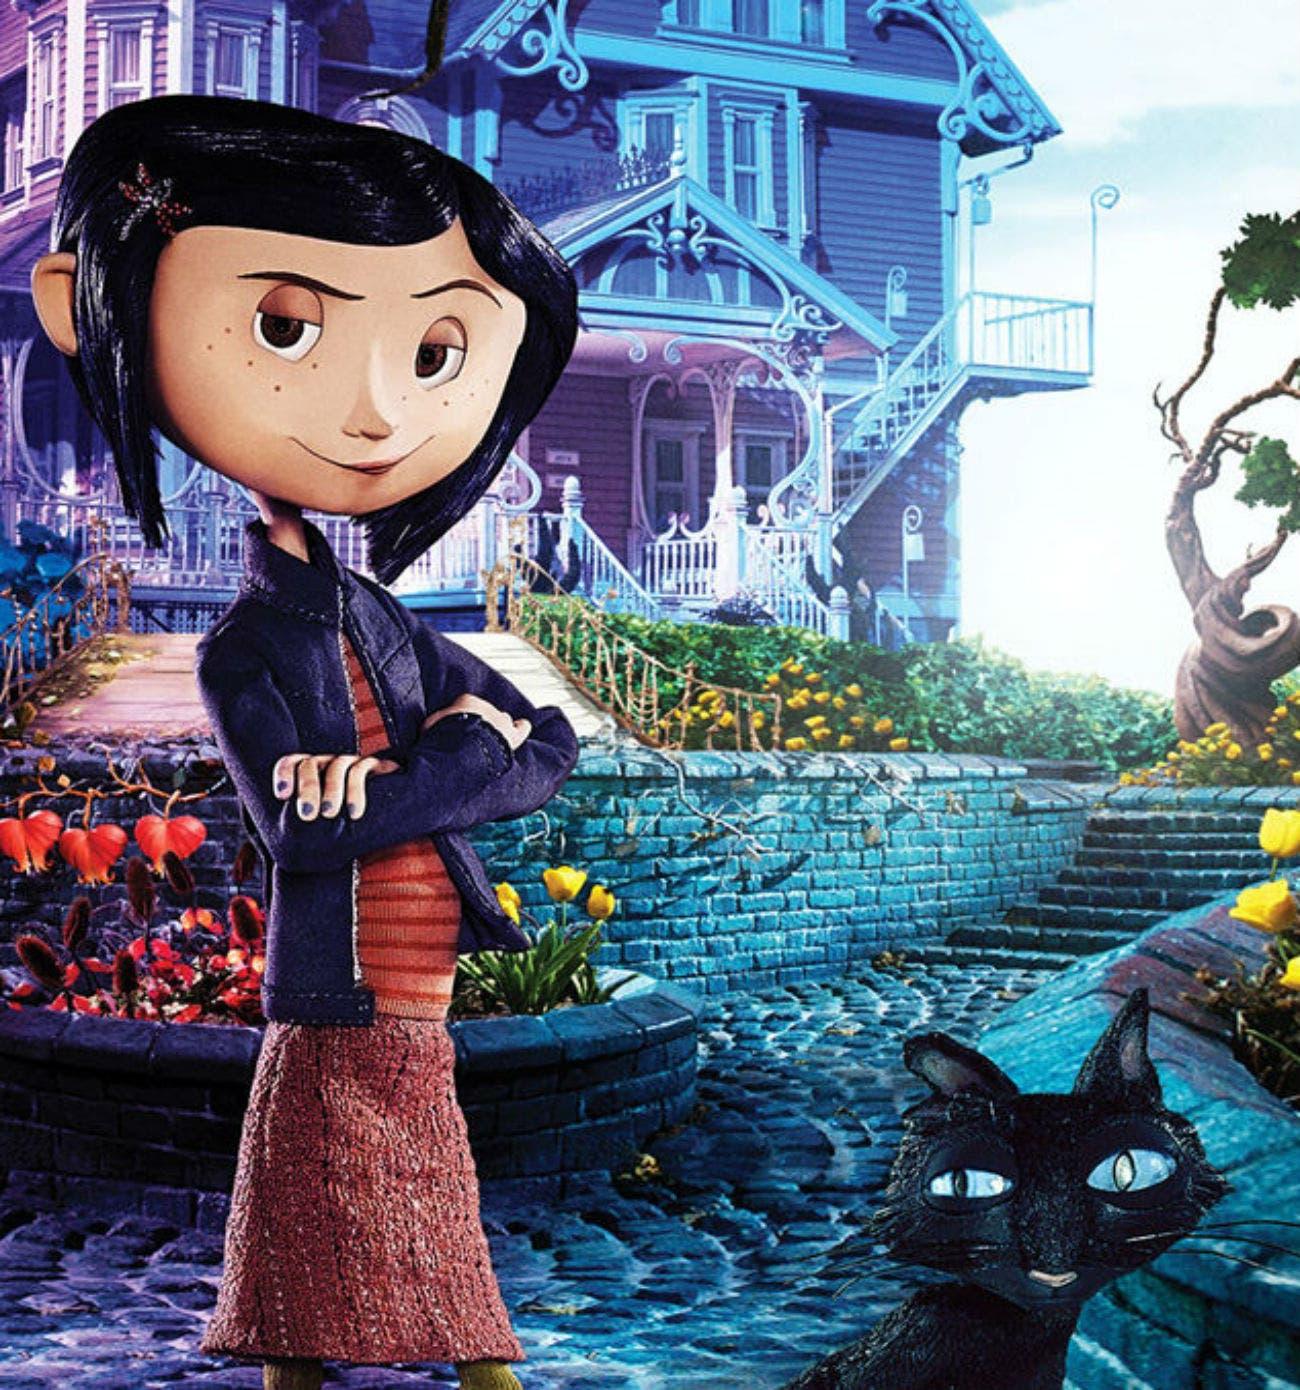 Día del niño: 10 películas infantiles que podés ver en Netflix